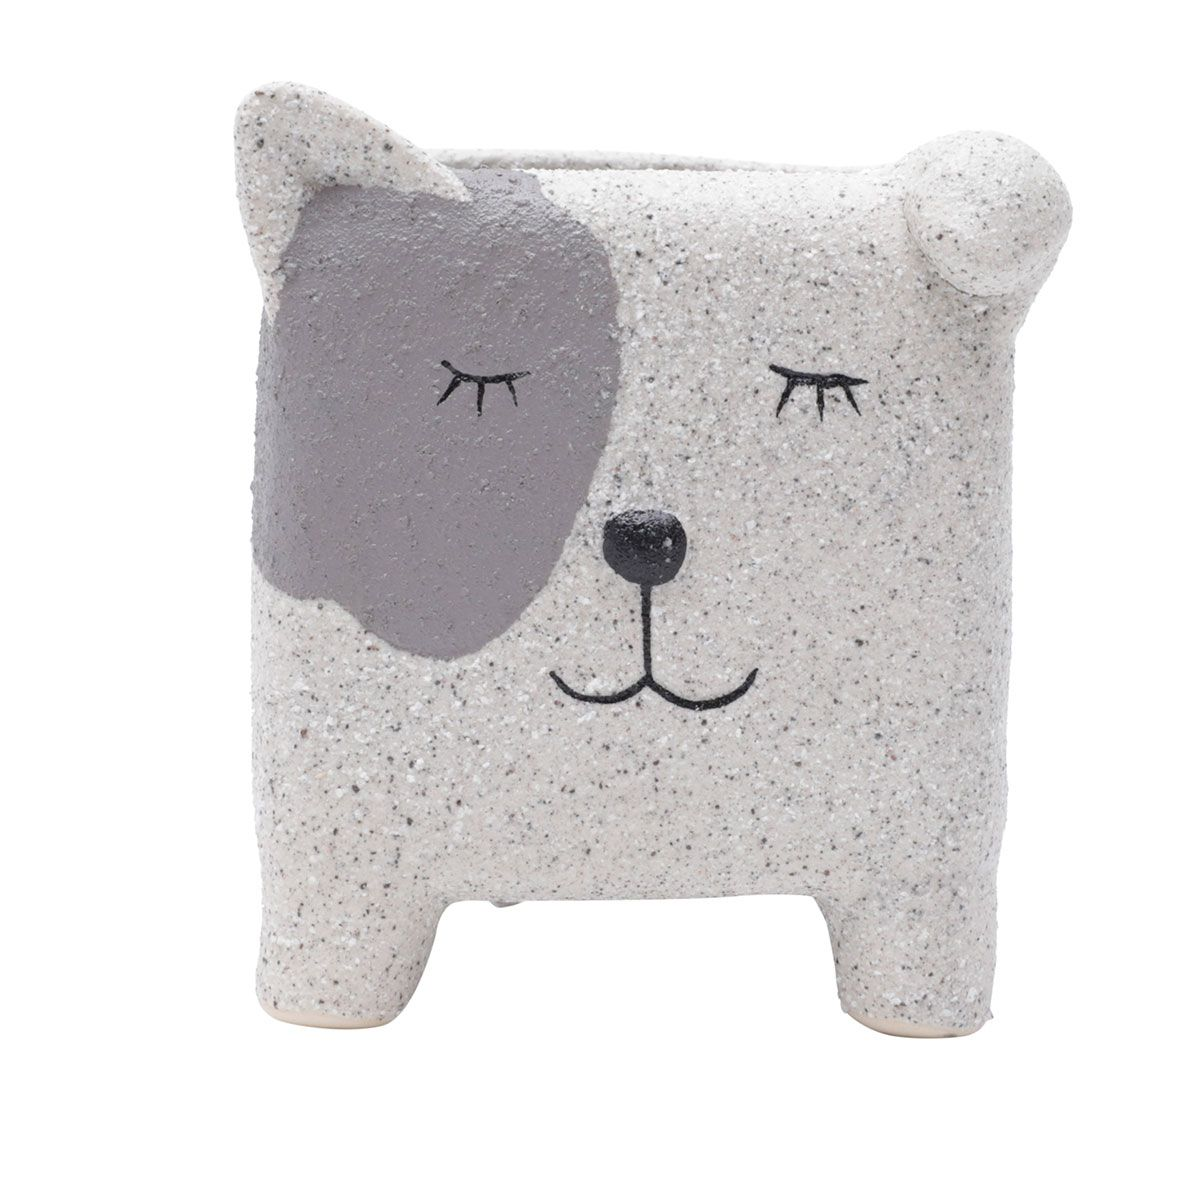 Cachepot Concreto Vaso Decorativo Sleeping Dog